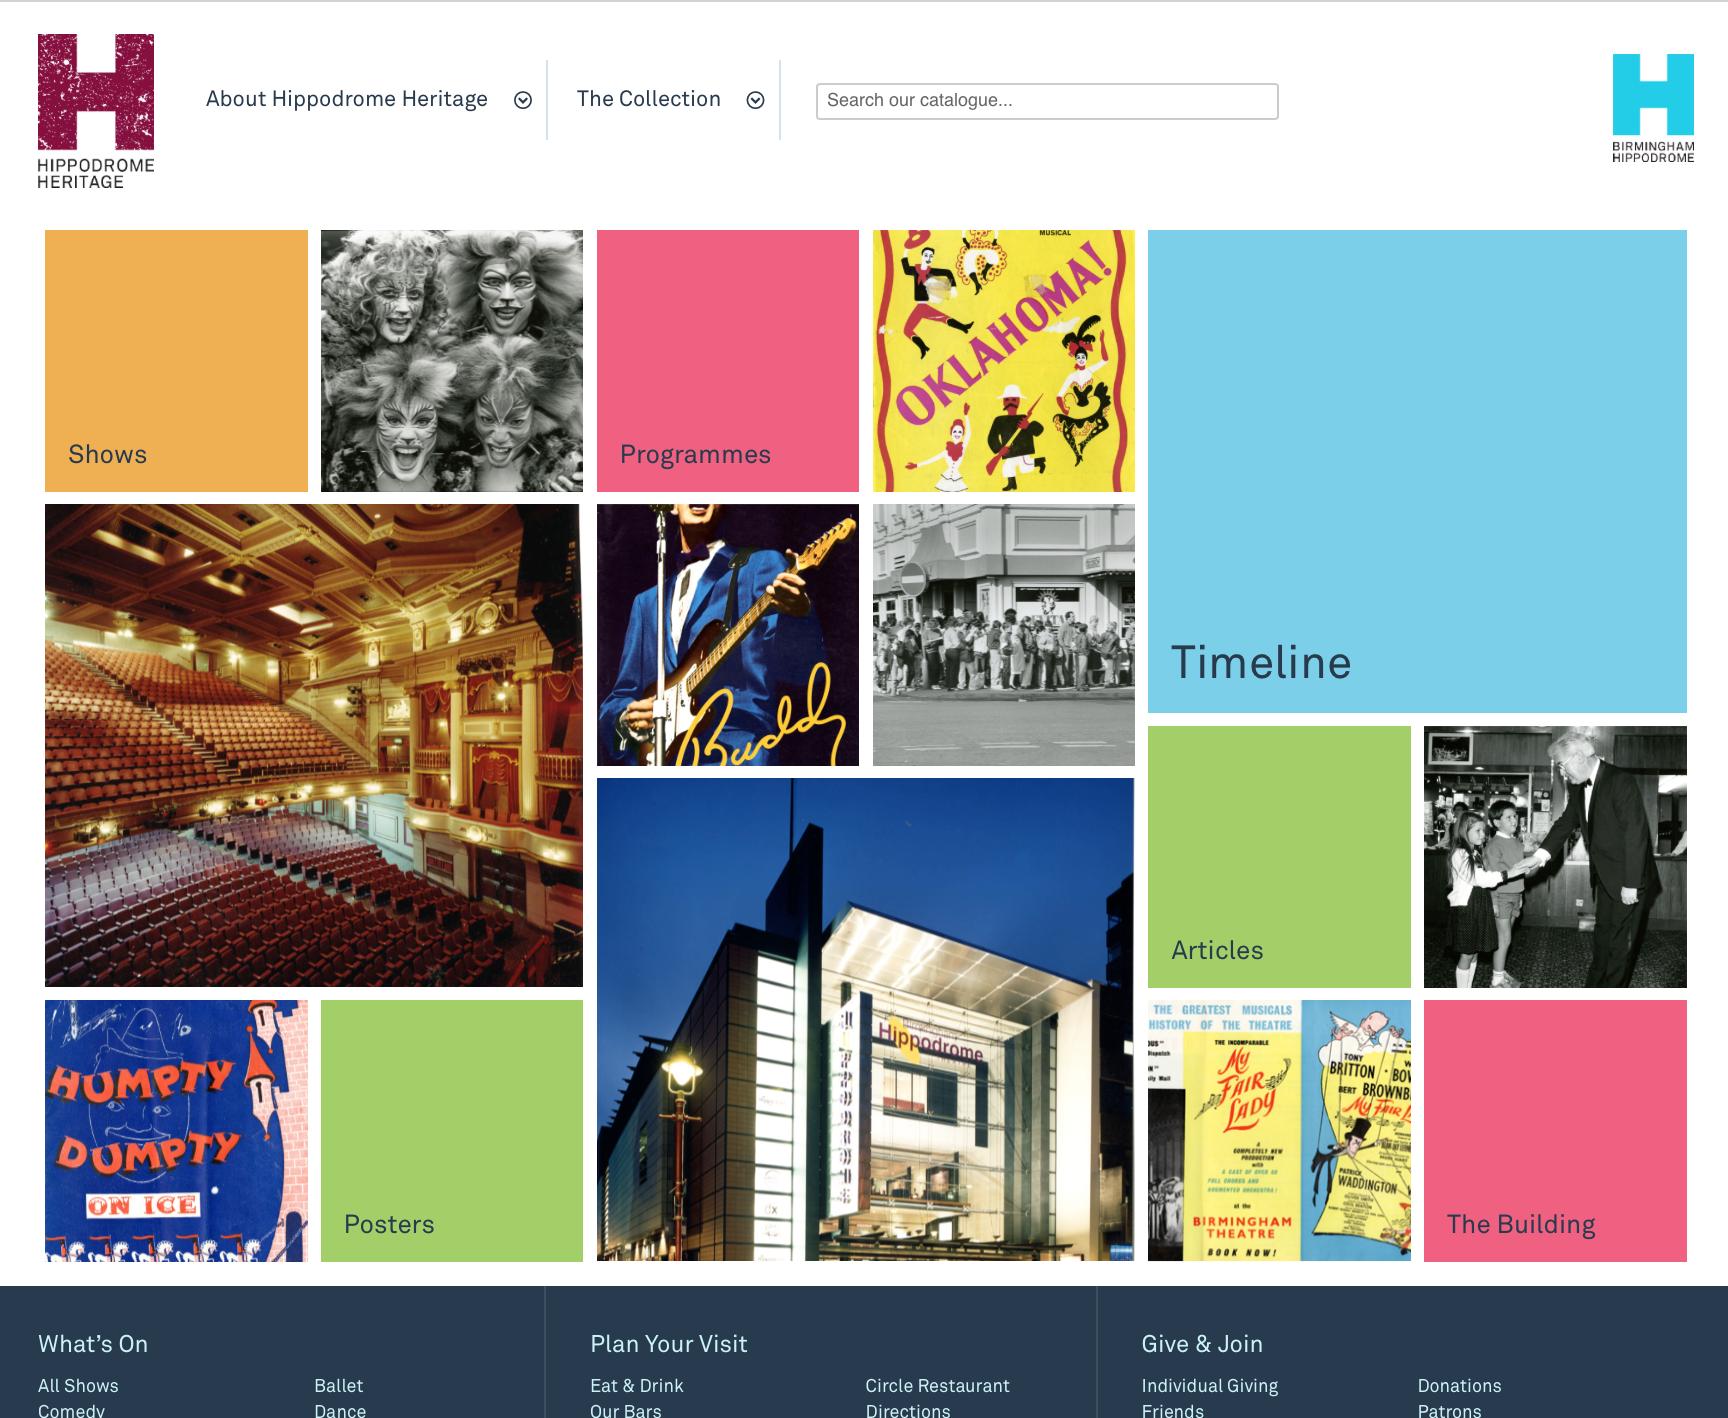 Birmingham Hippodrome Heritage website